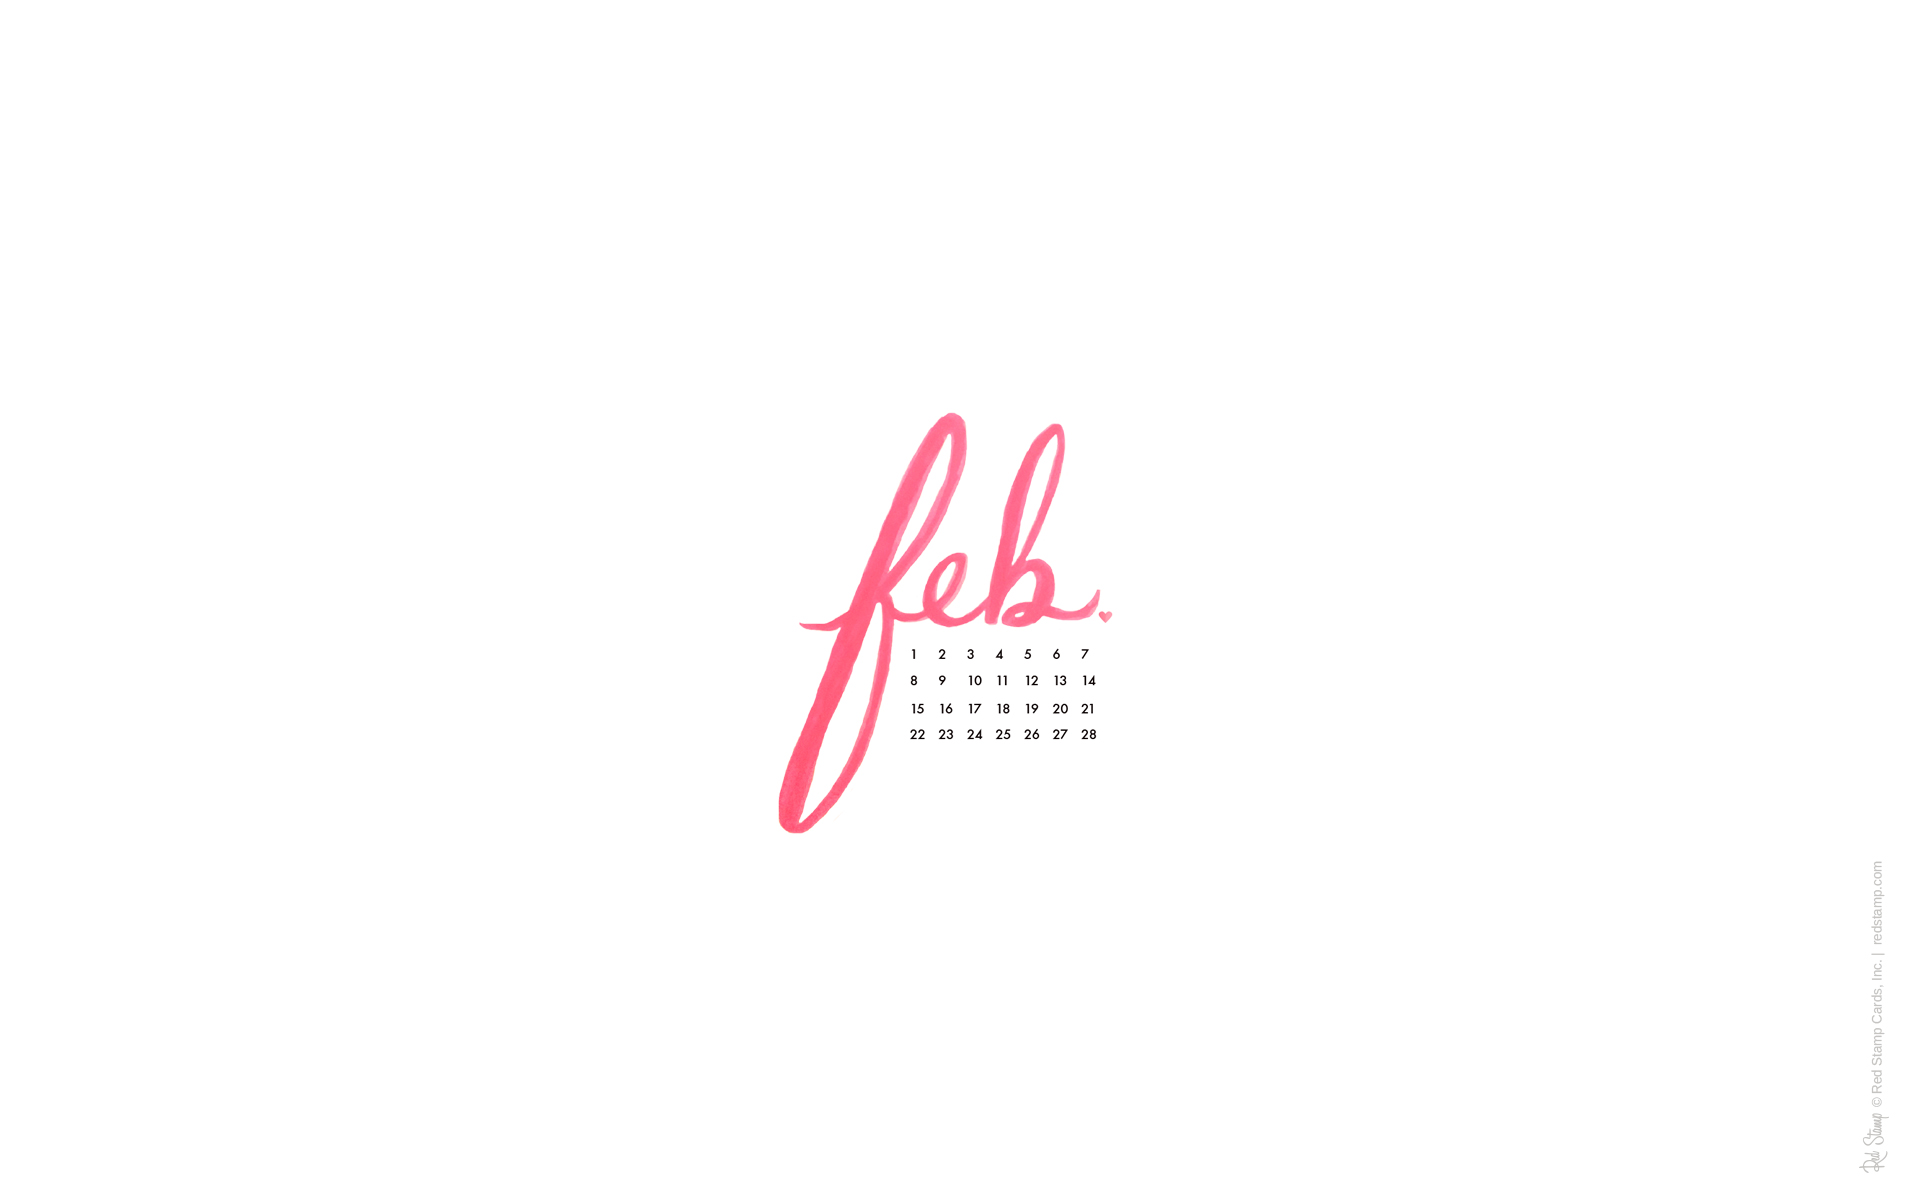 Desktop Calendar February 2015